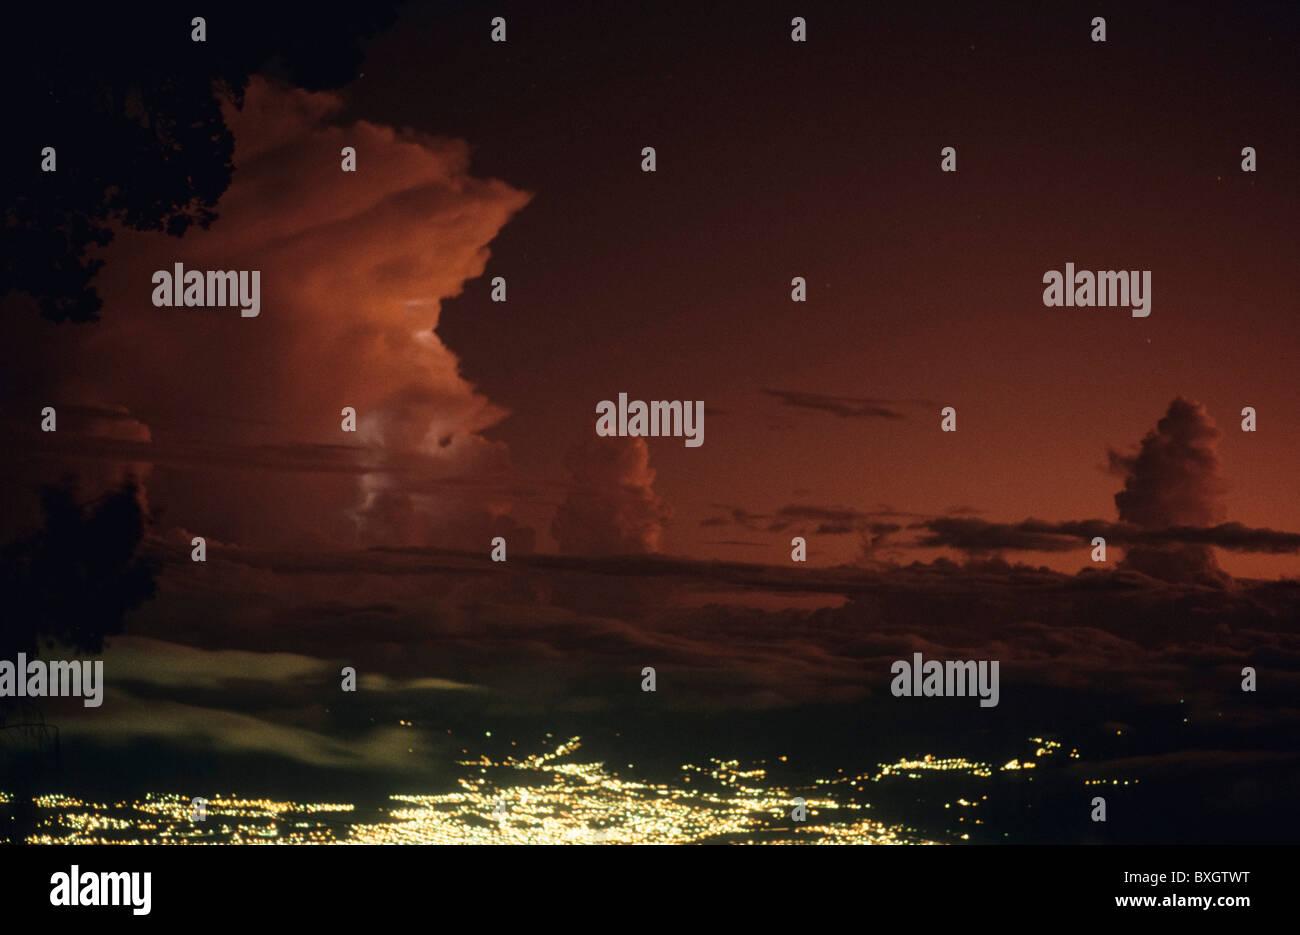 Costa Rica, Irazu, landscape, san jose, thundercloud, night, lights, city, clouds, stars - Stock Image